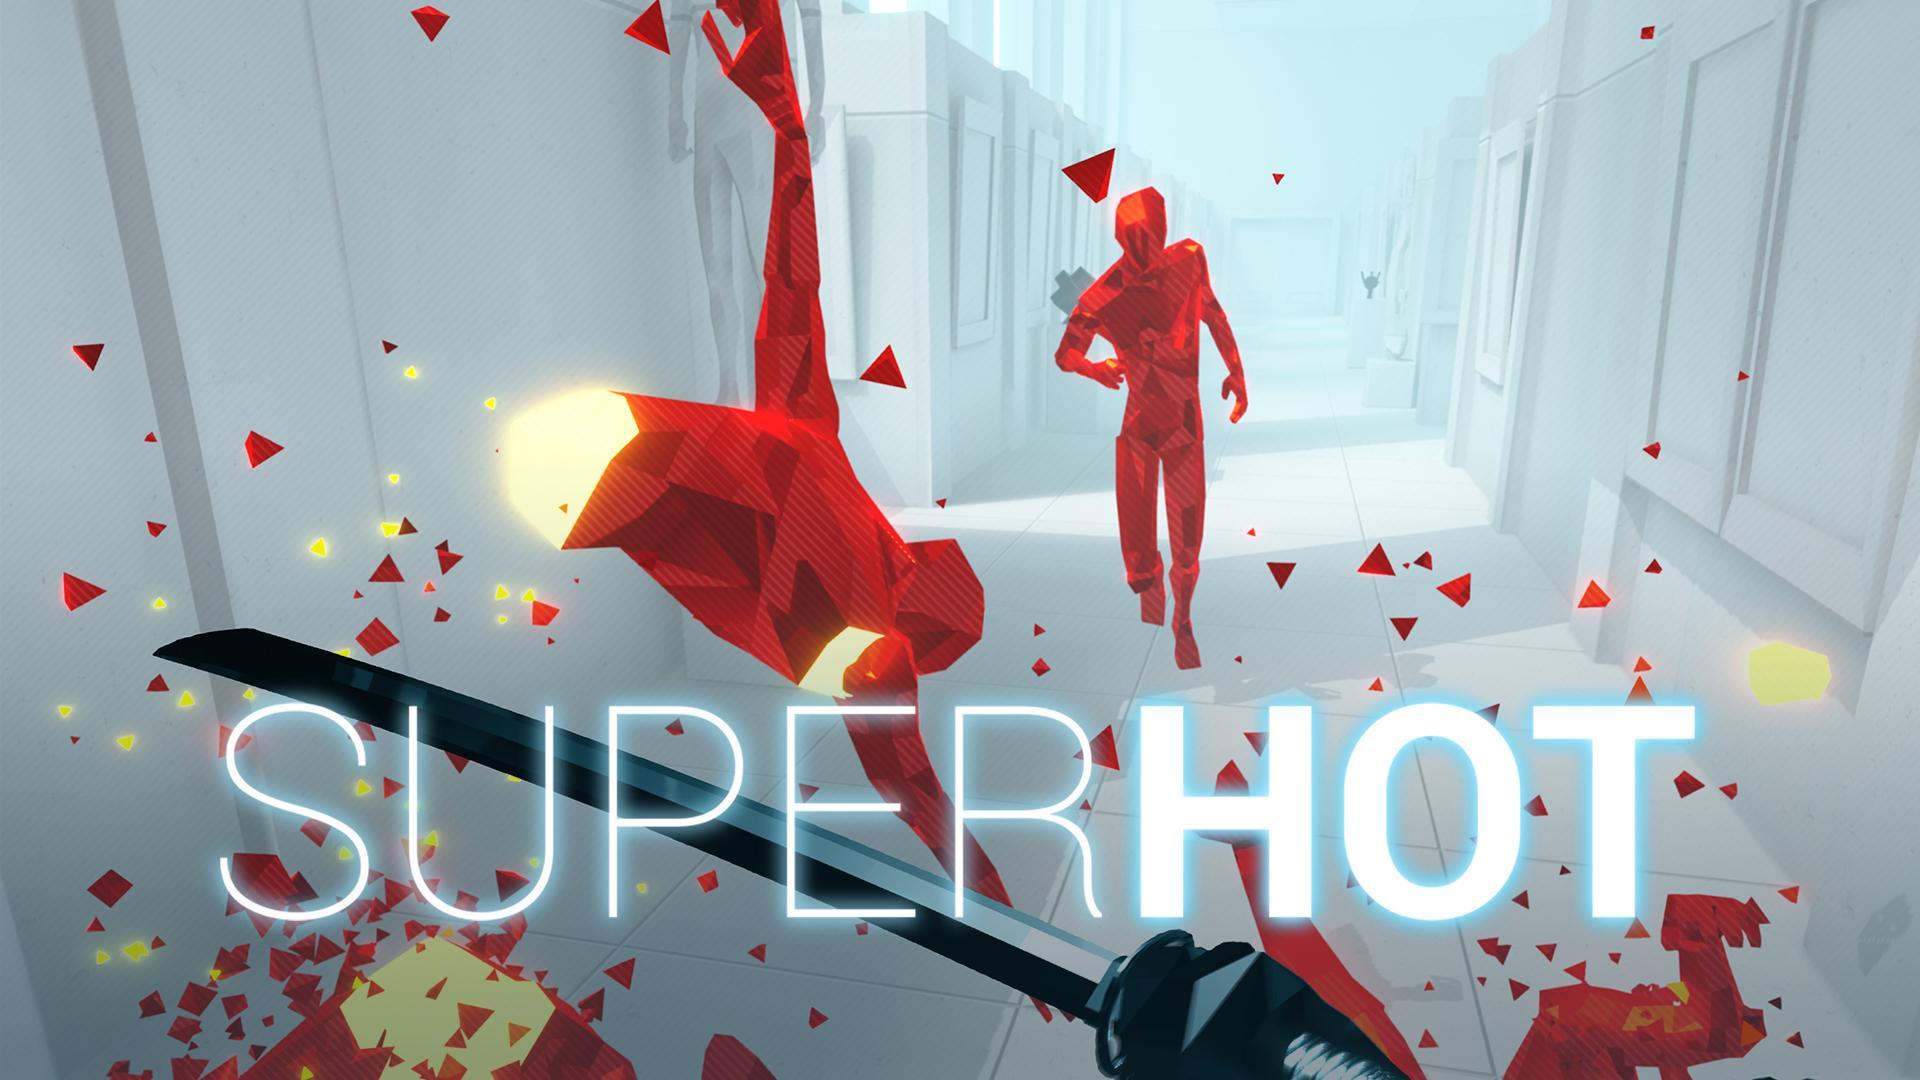 SUPERHOT iOS/APK Version Full Free Download